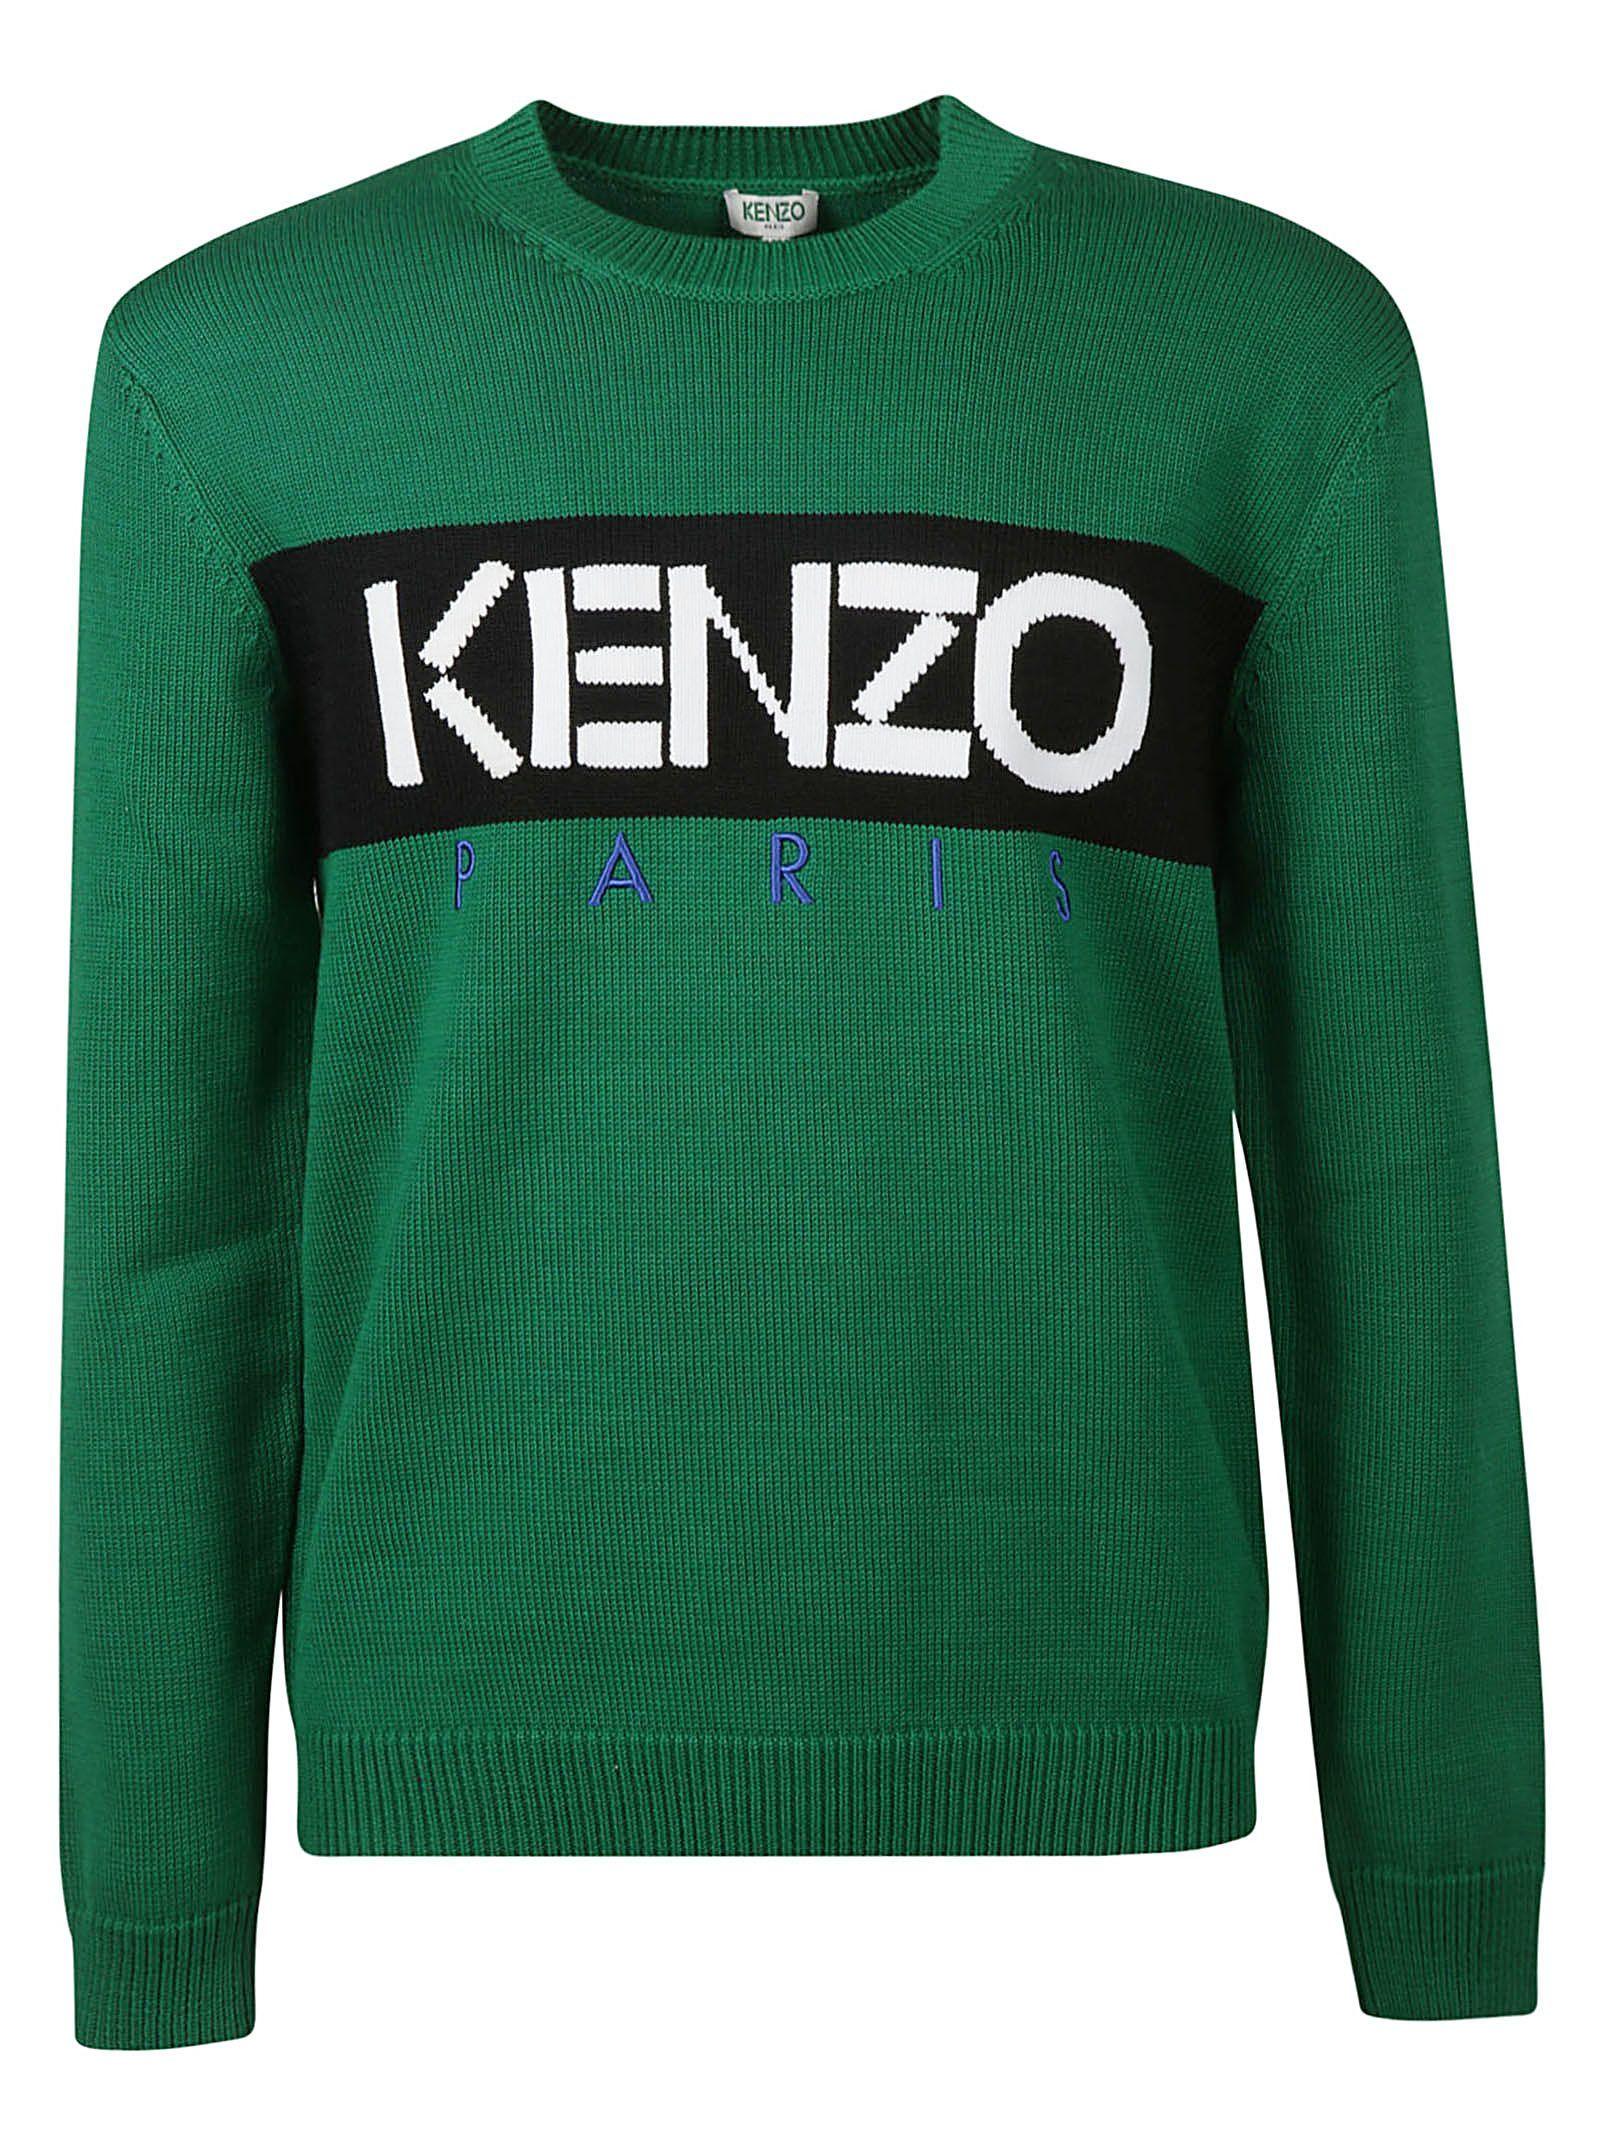 24b5f5df0 KENZO LOGO KNIT SWEATSHIRT. #kenzo #cloth | Kenzo in 2019 | Kenzo ...